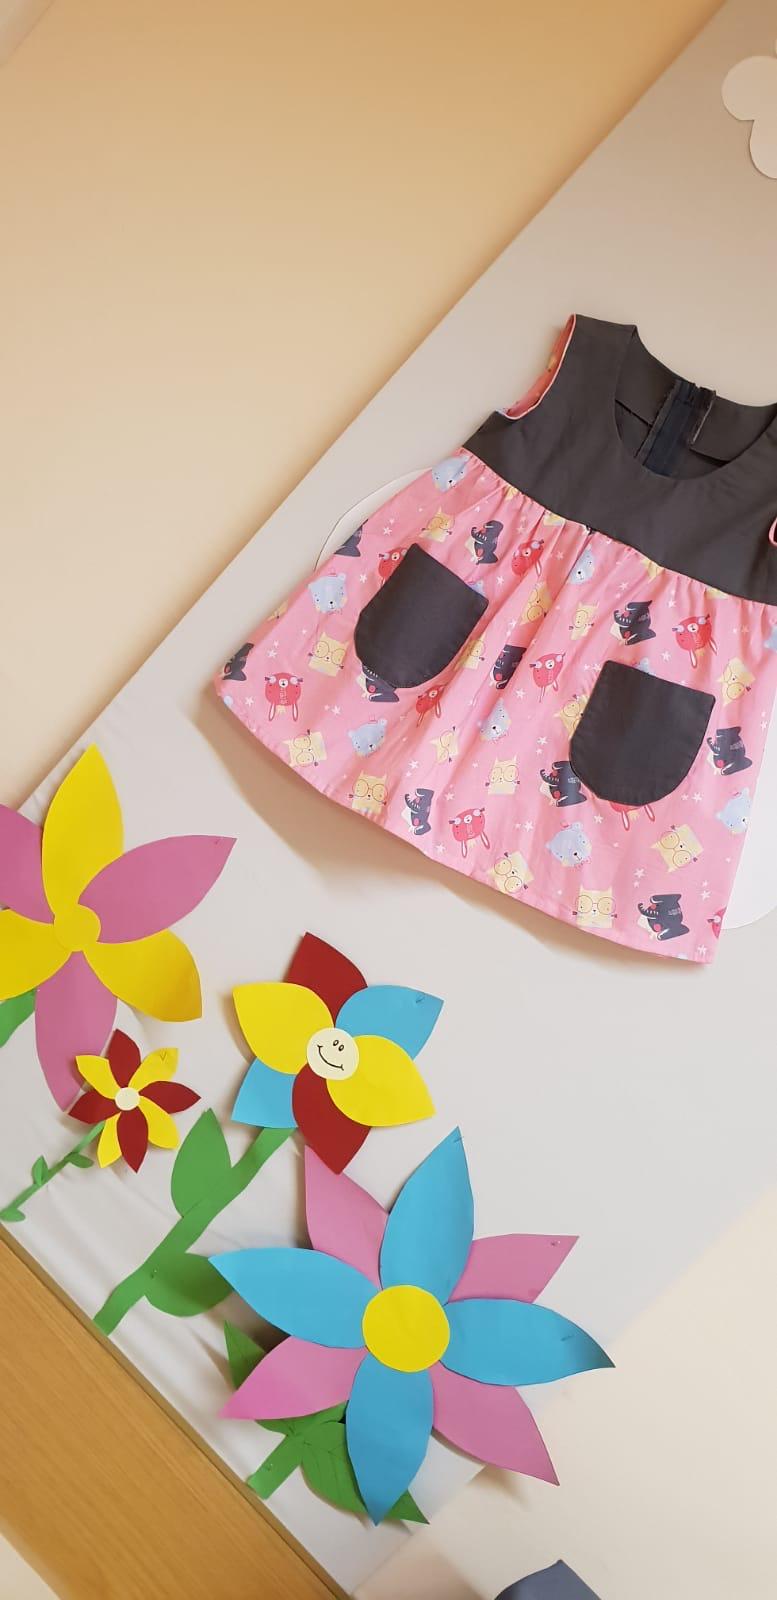 Textildesign (8)